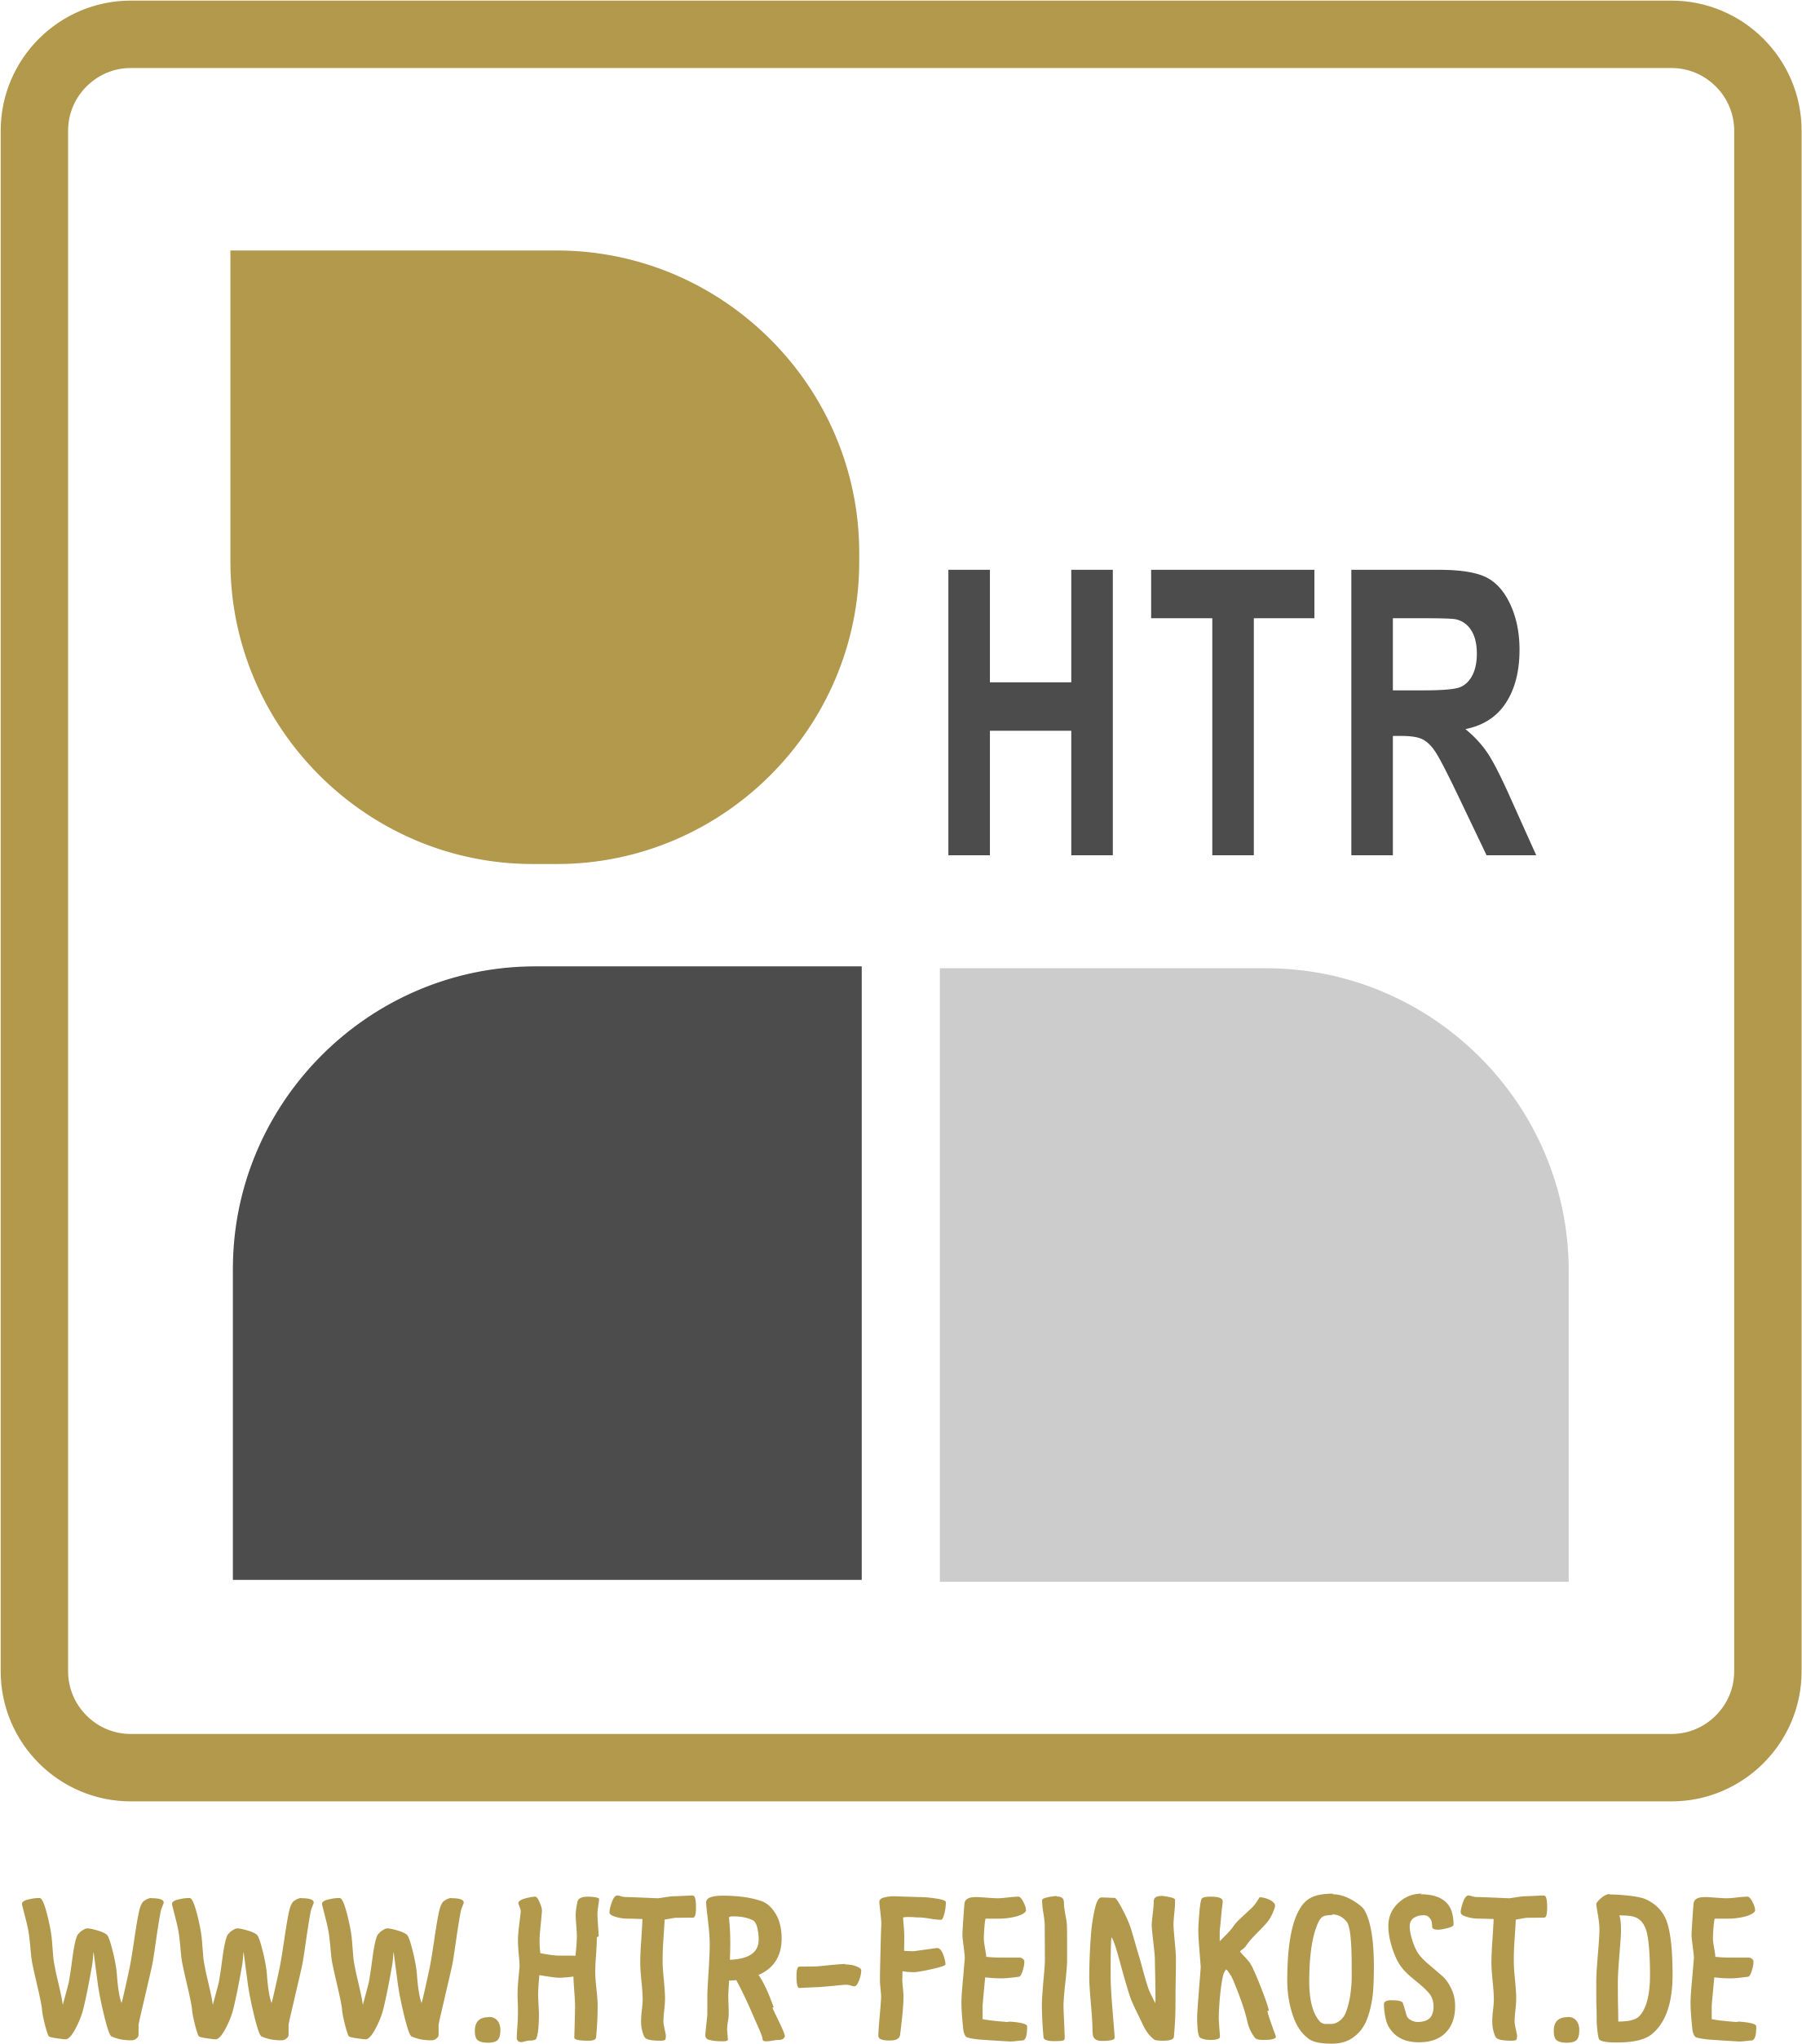 HTR Feinkost Genußladal-Logo